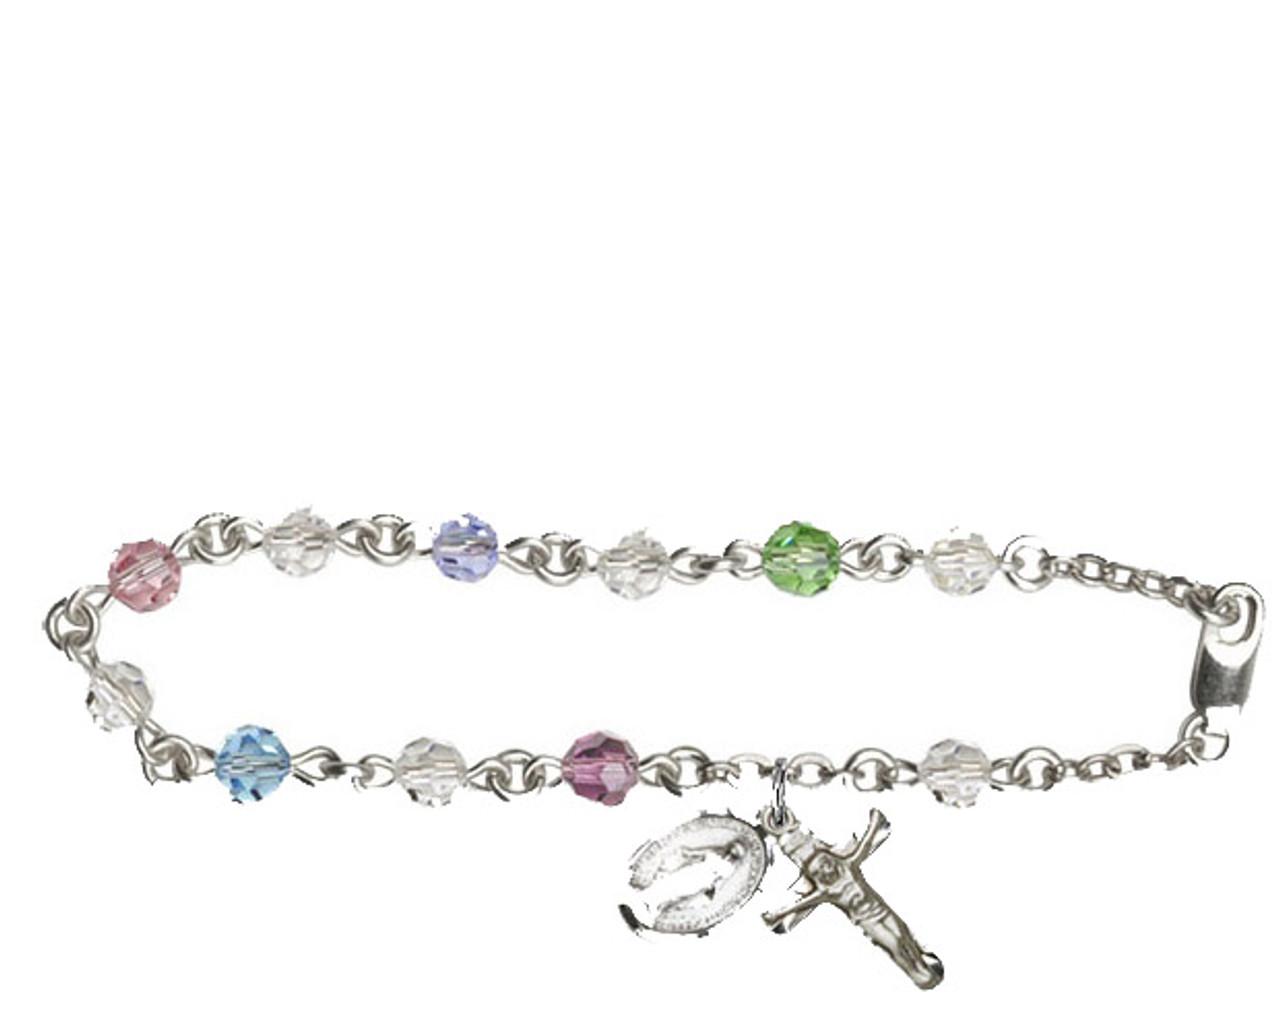 Bliss Sterling, Gold Filled and 14 Karat Rosary Bracelet with Swarovski Beads